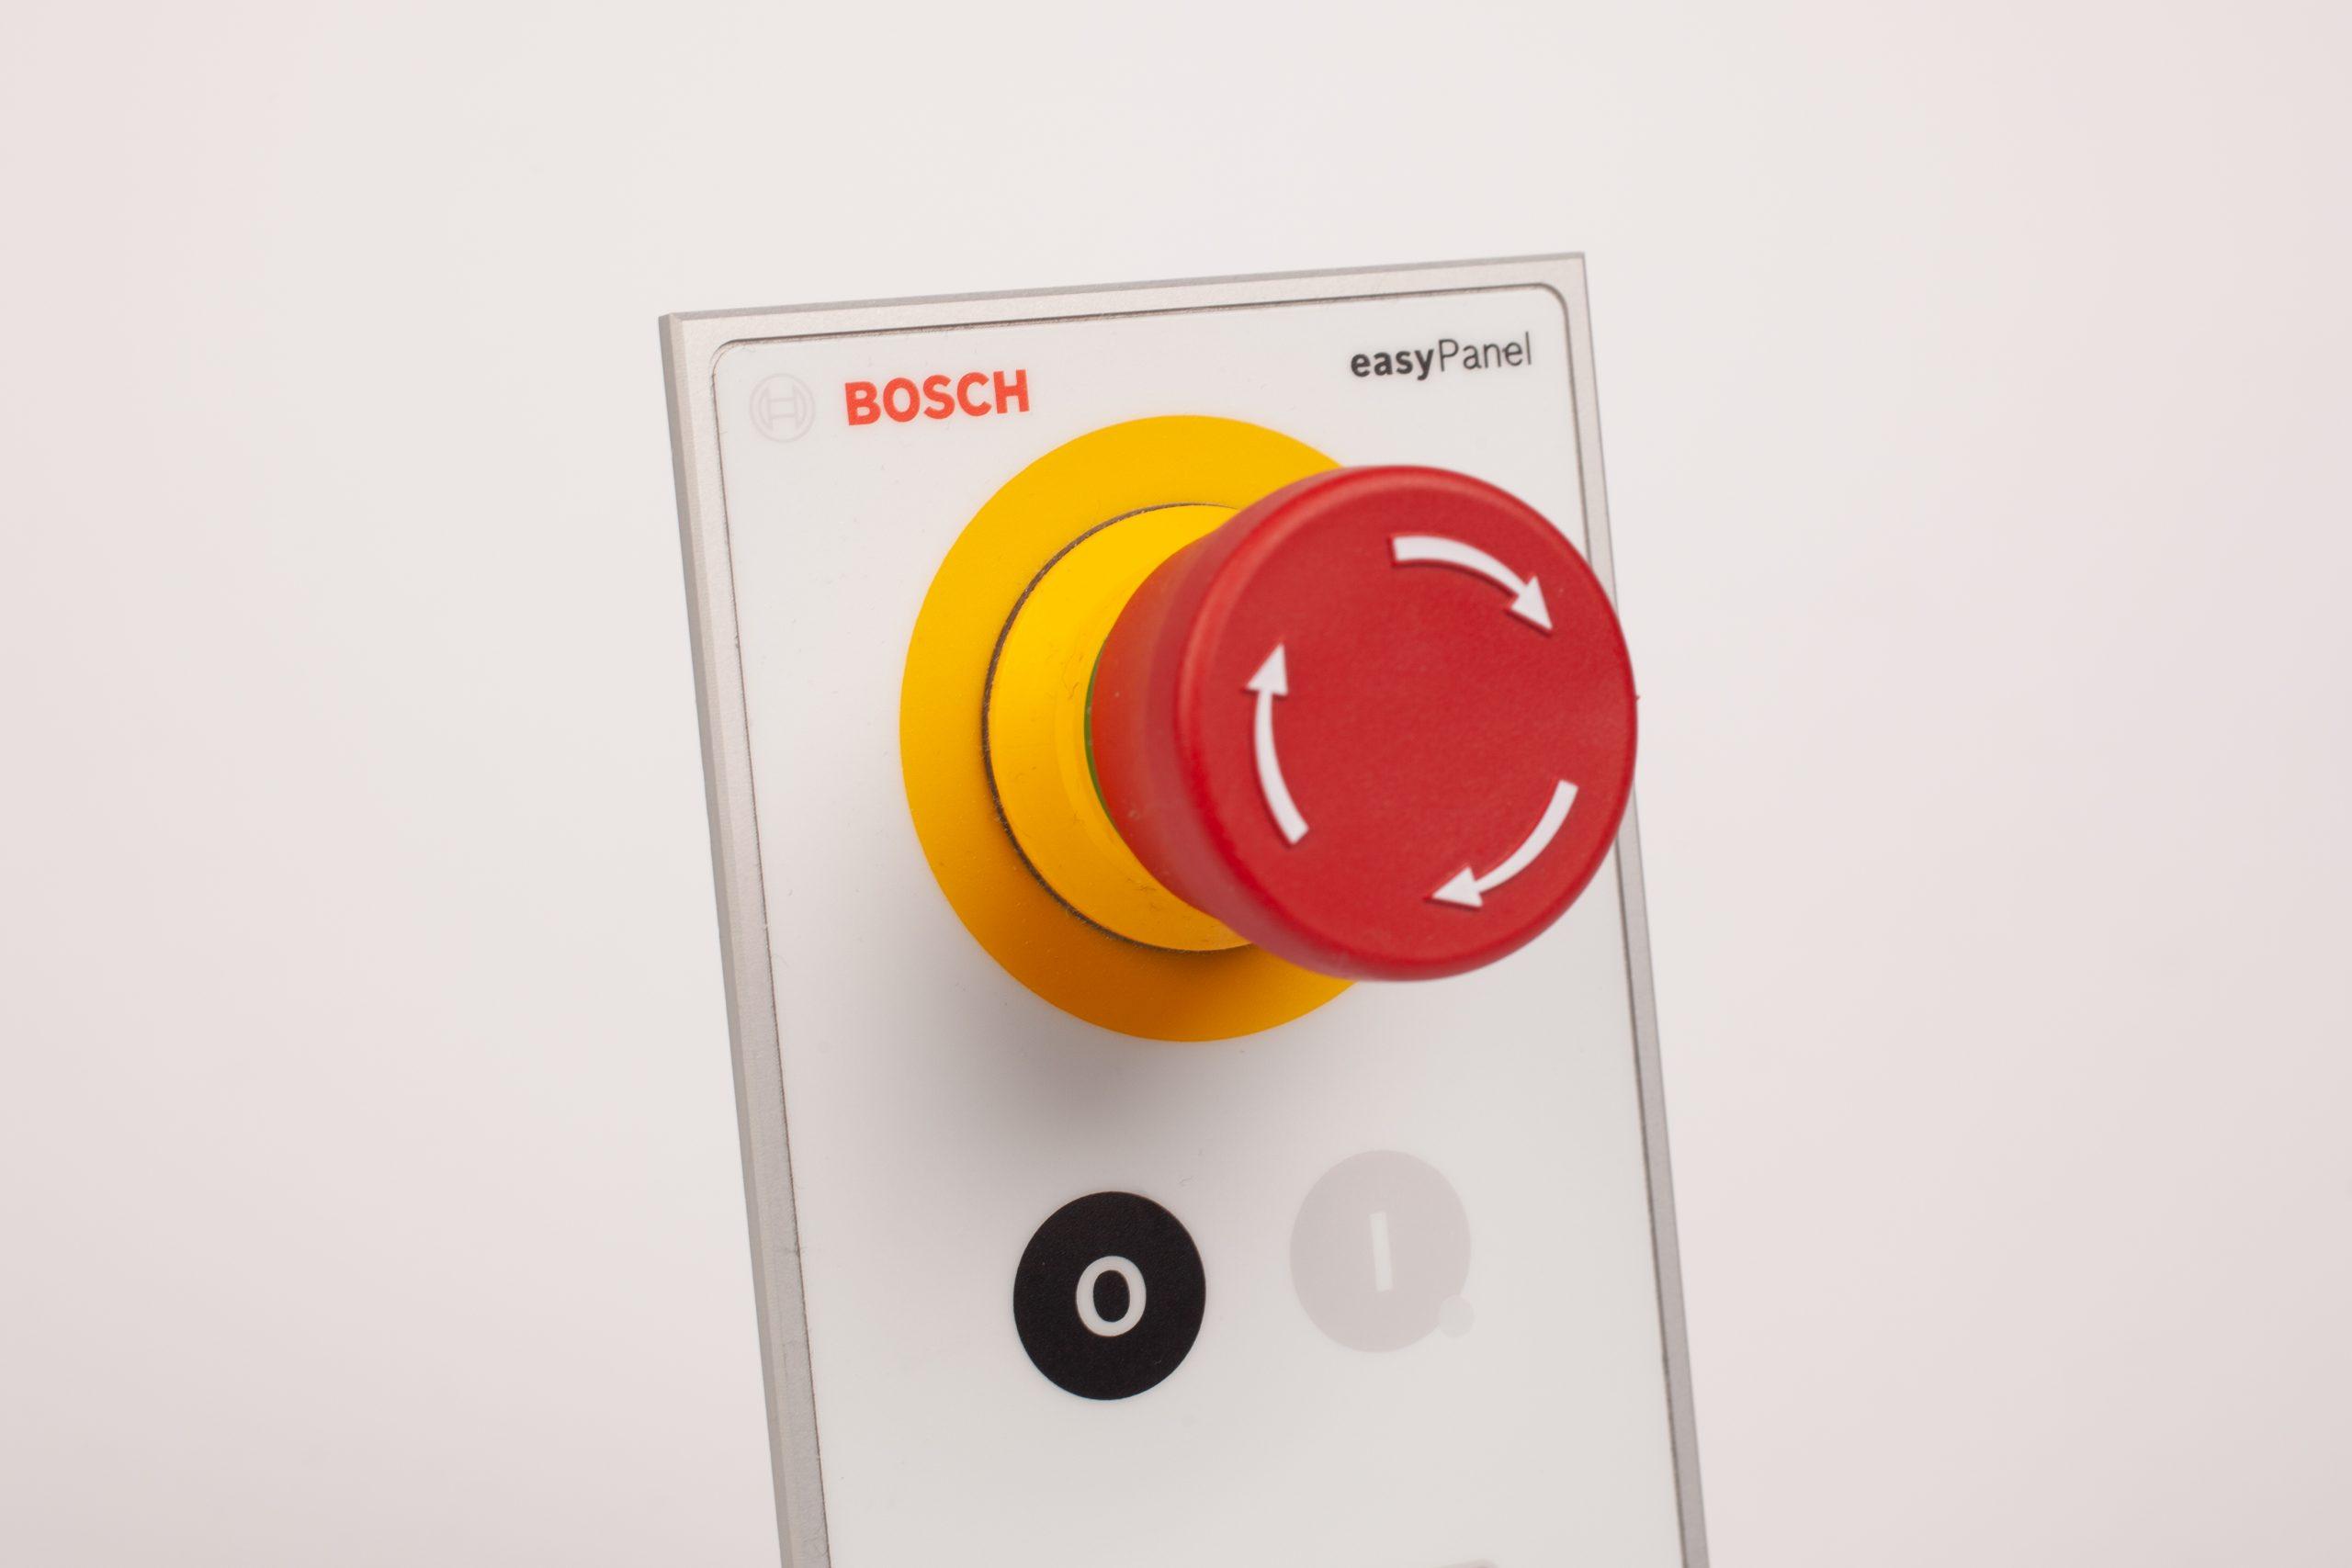 Bosch »easyPanel«